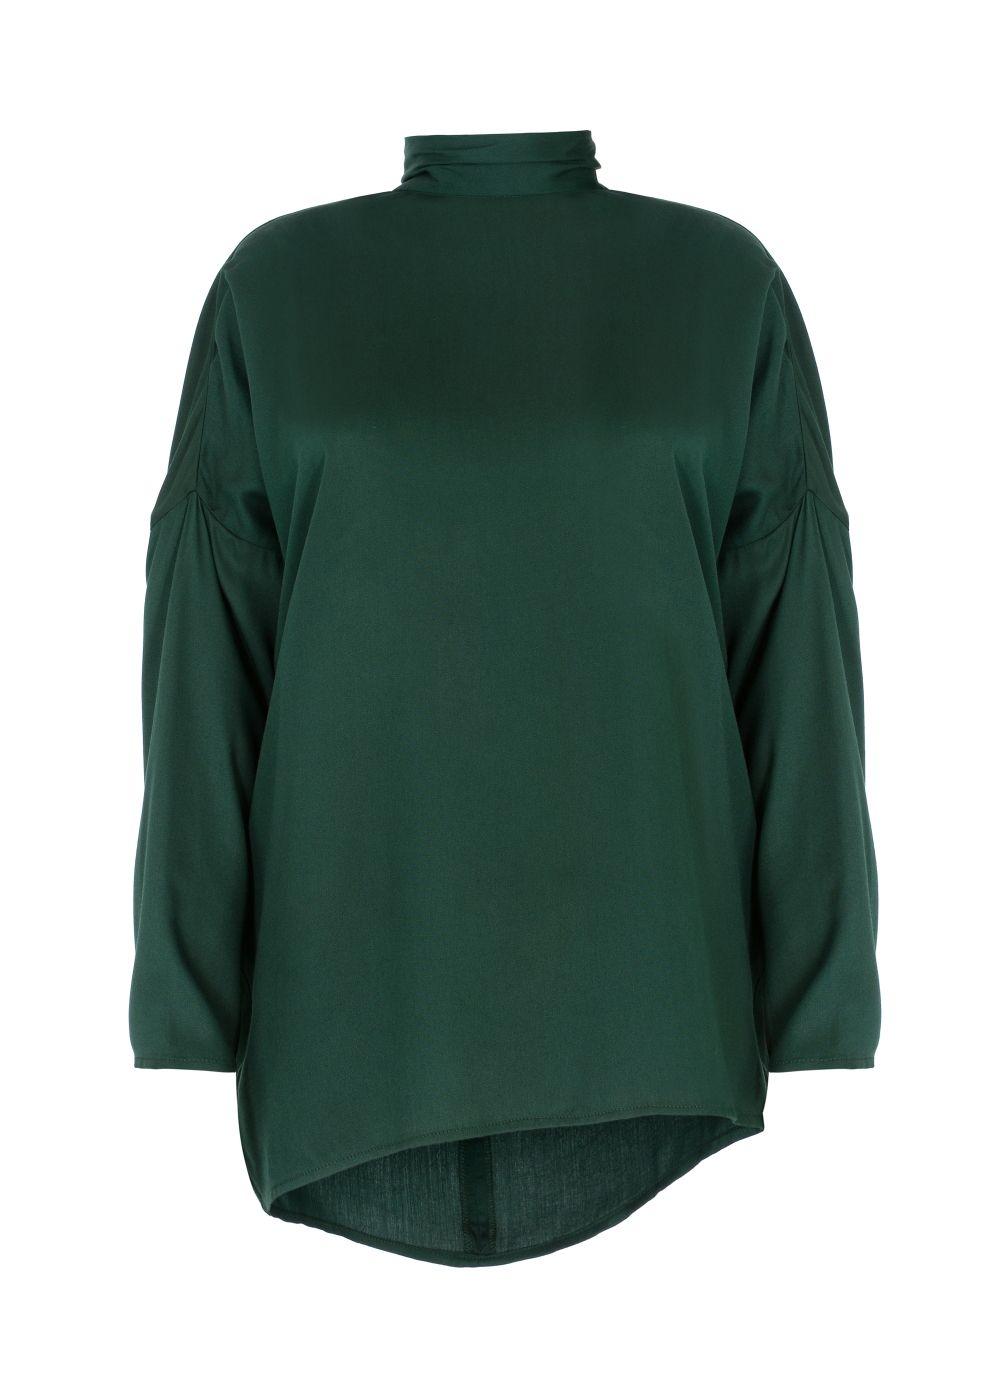 Koszula damska BLUDT-0113-51(Z20)